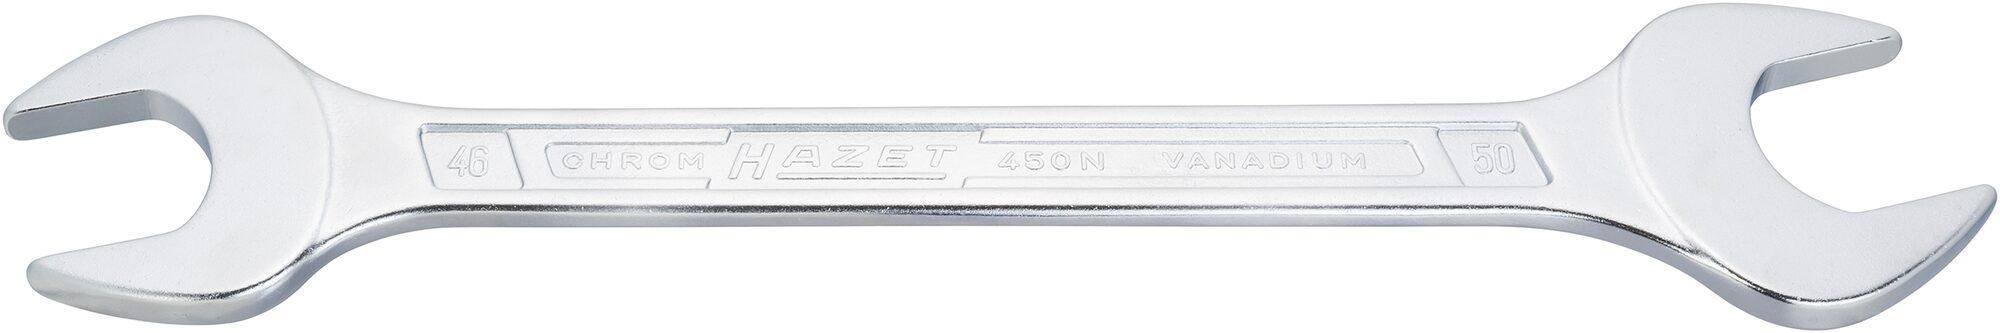 HAZET Doppel-Maulschlüssel 450N-22X24 ∙ Außen-Sechskant Profil ∙ 22 x 24 mm